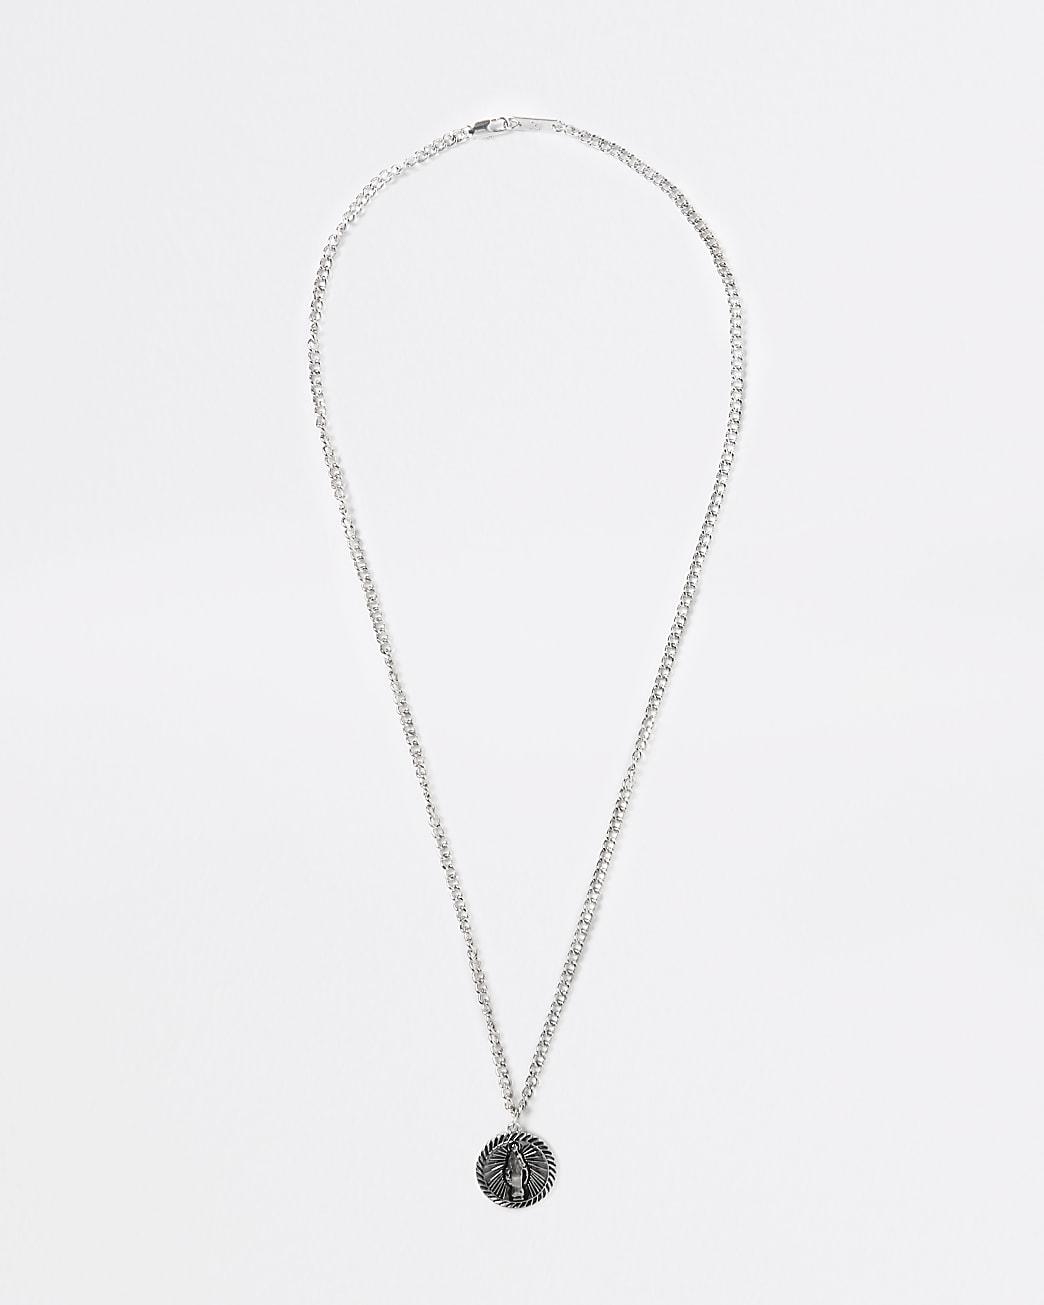 Silver engraved coin necklace